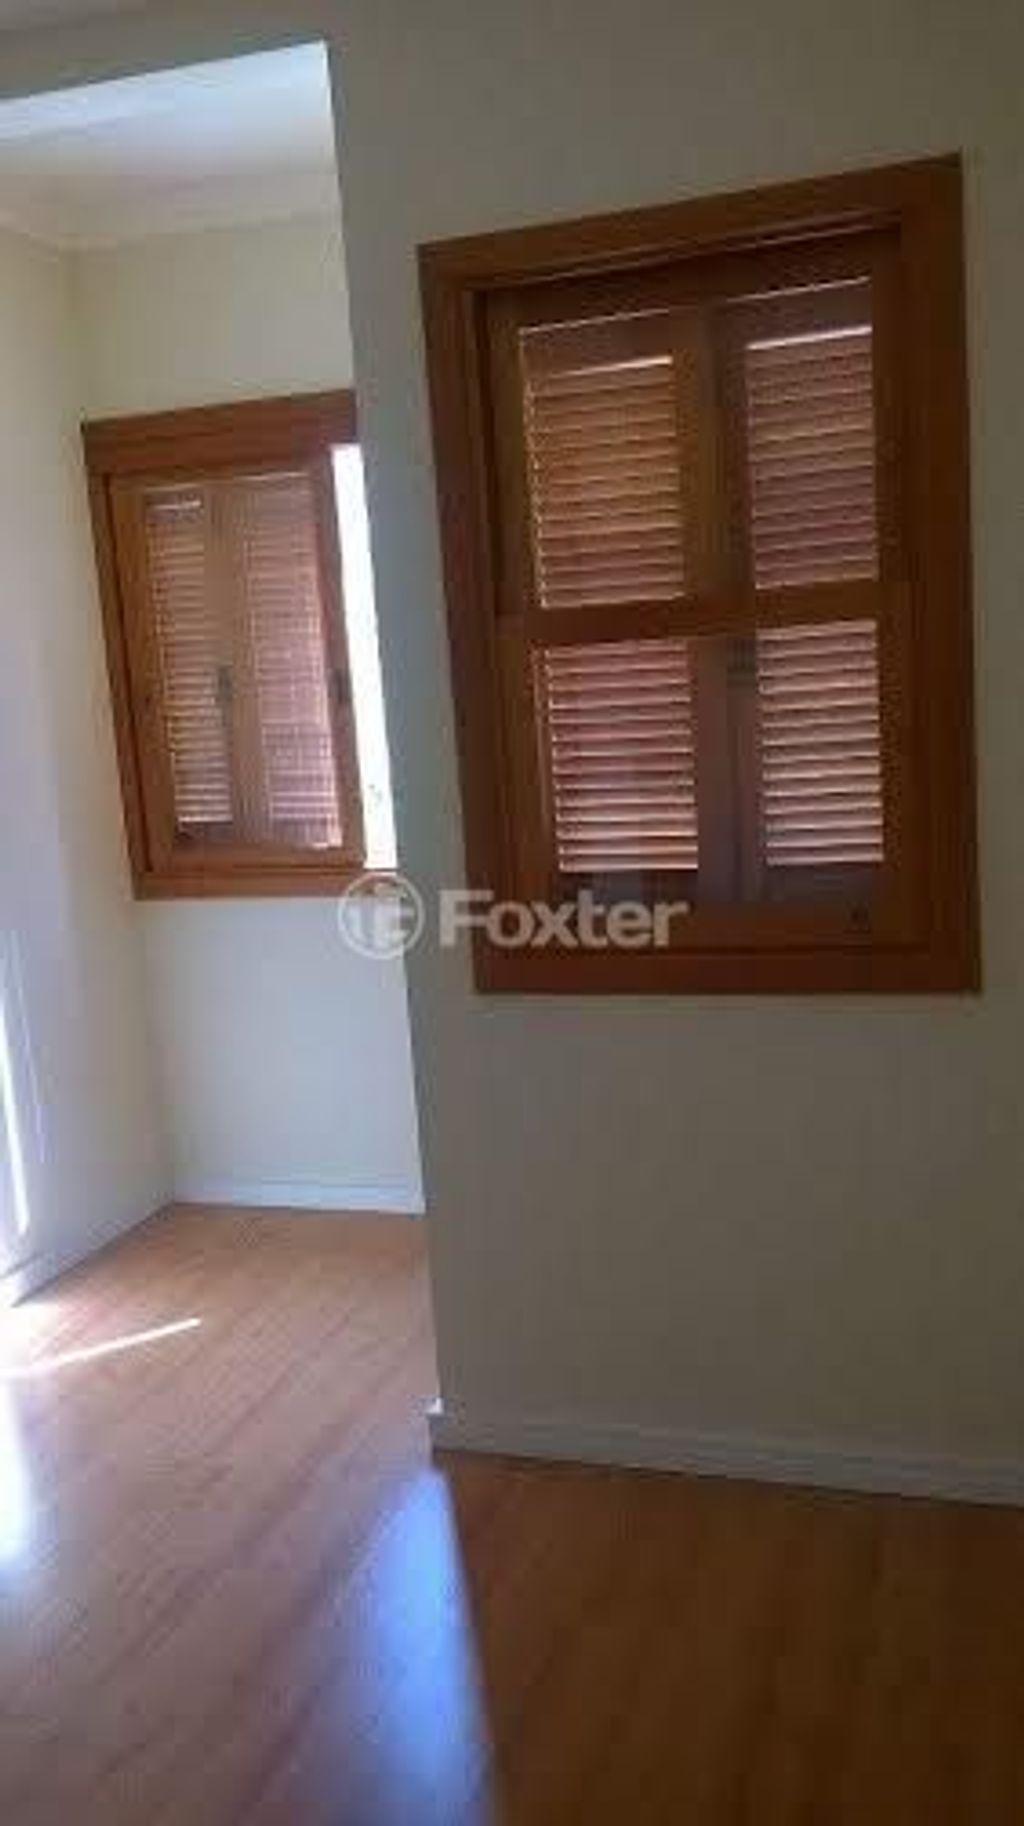 Casa 3 Dorm, Aberta dos Morros, Porto Alegre (139891) - Foto 38